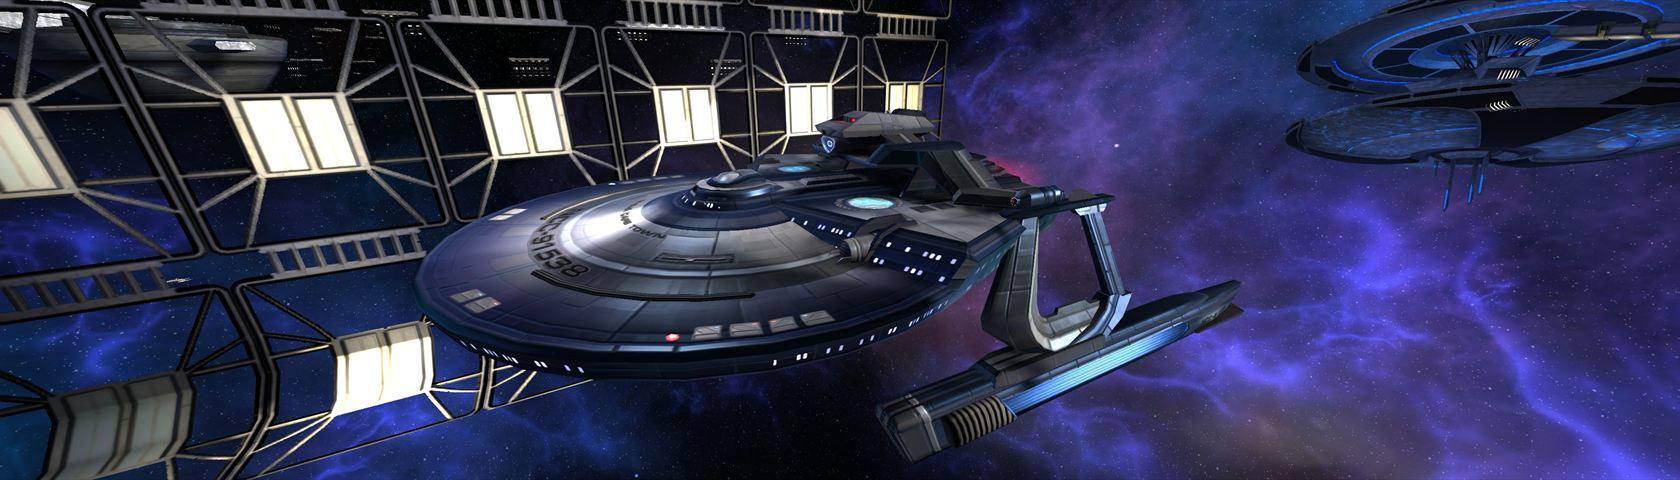 Star Trek Space Dock